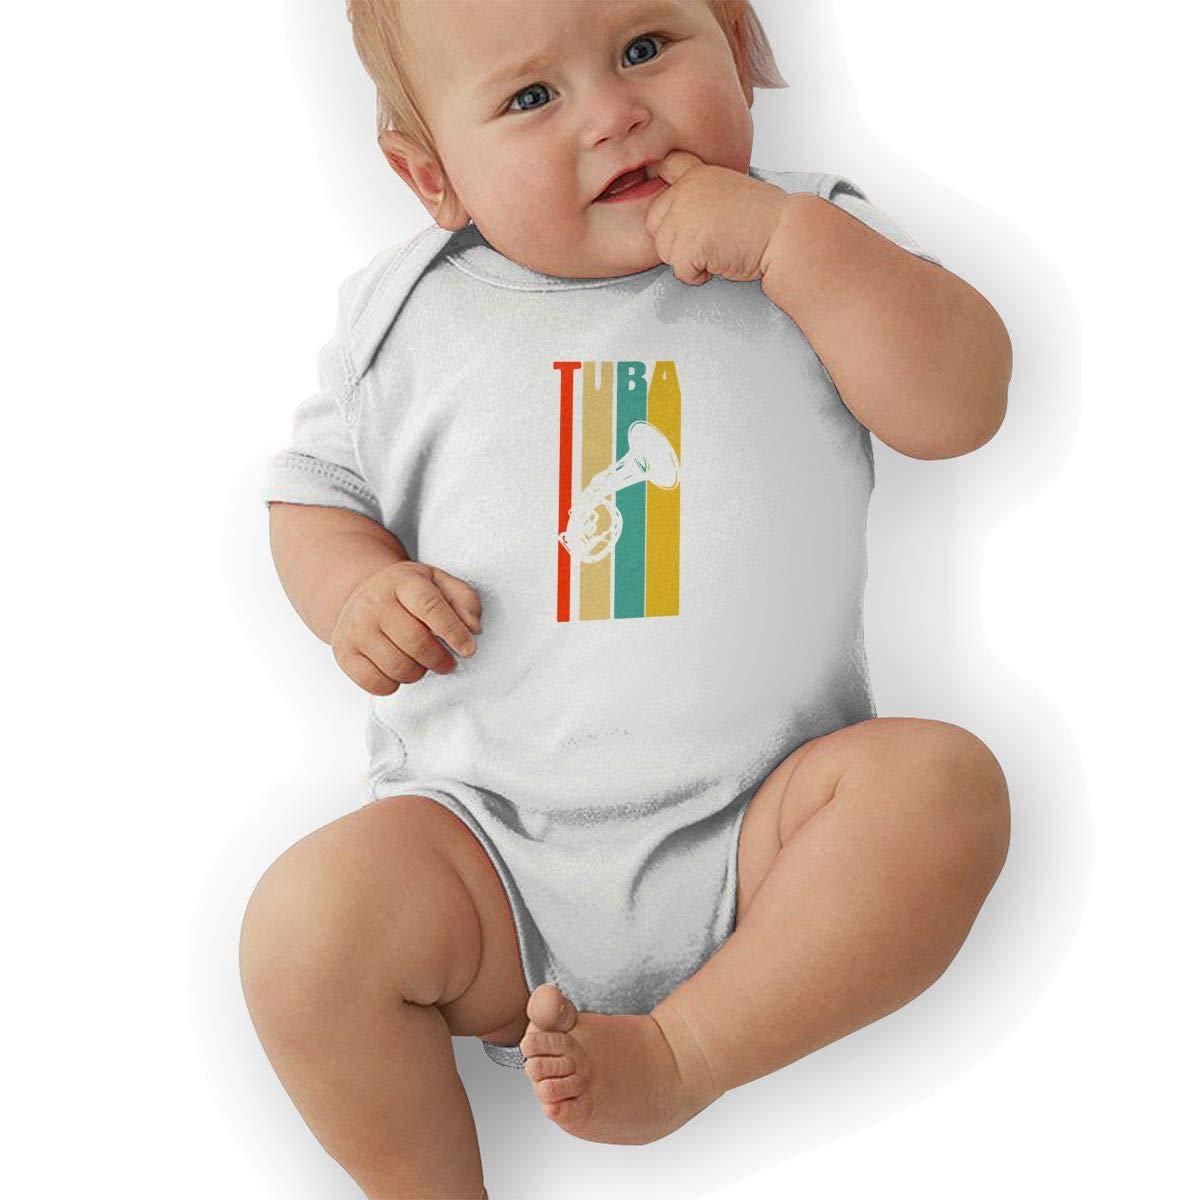 HappyLifea Tuba Newborn Baby Short Sleeve Romper Infant Summer Clothing Black